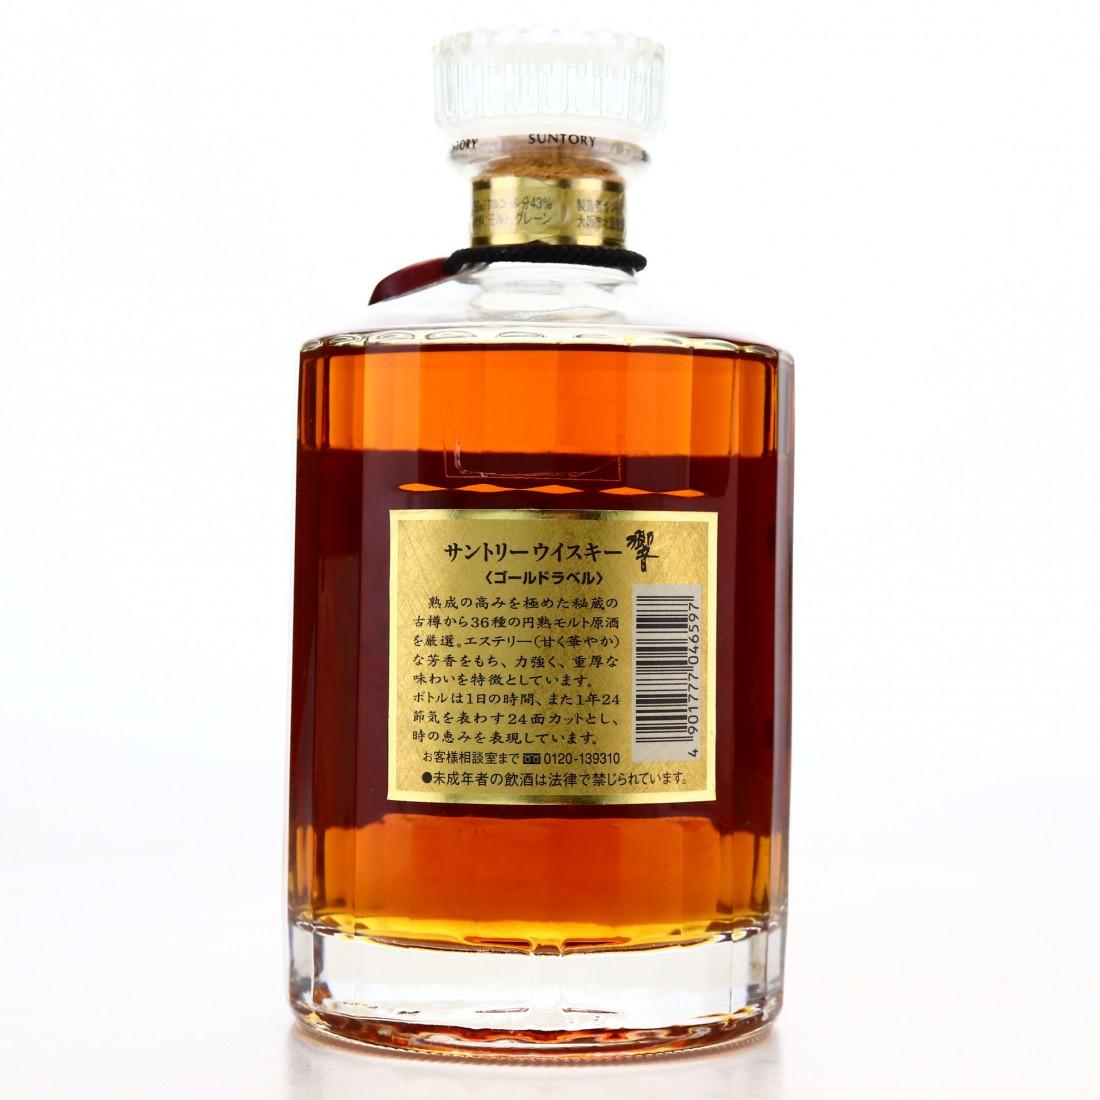 Hibiki Suntory Whisky